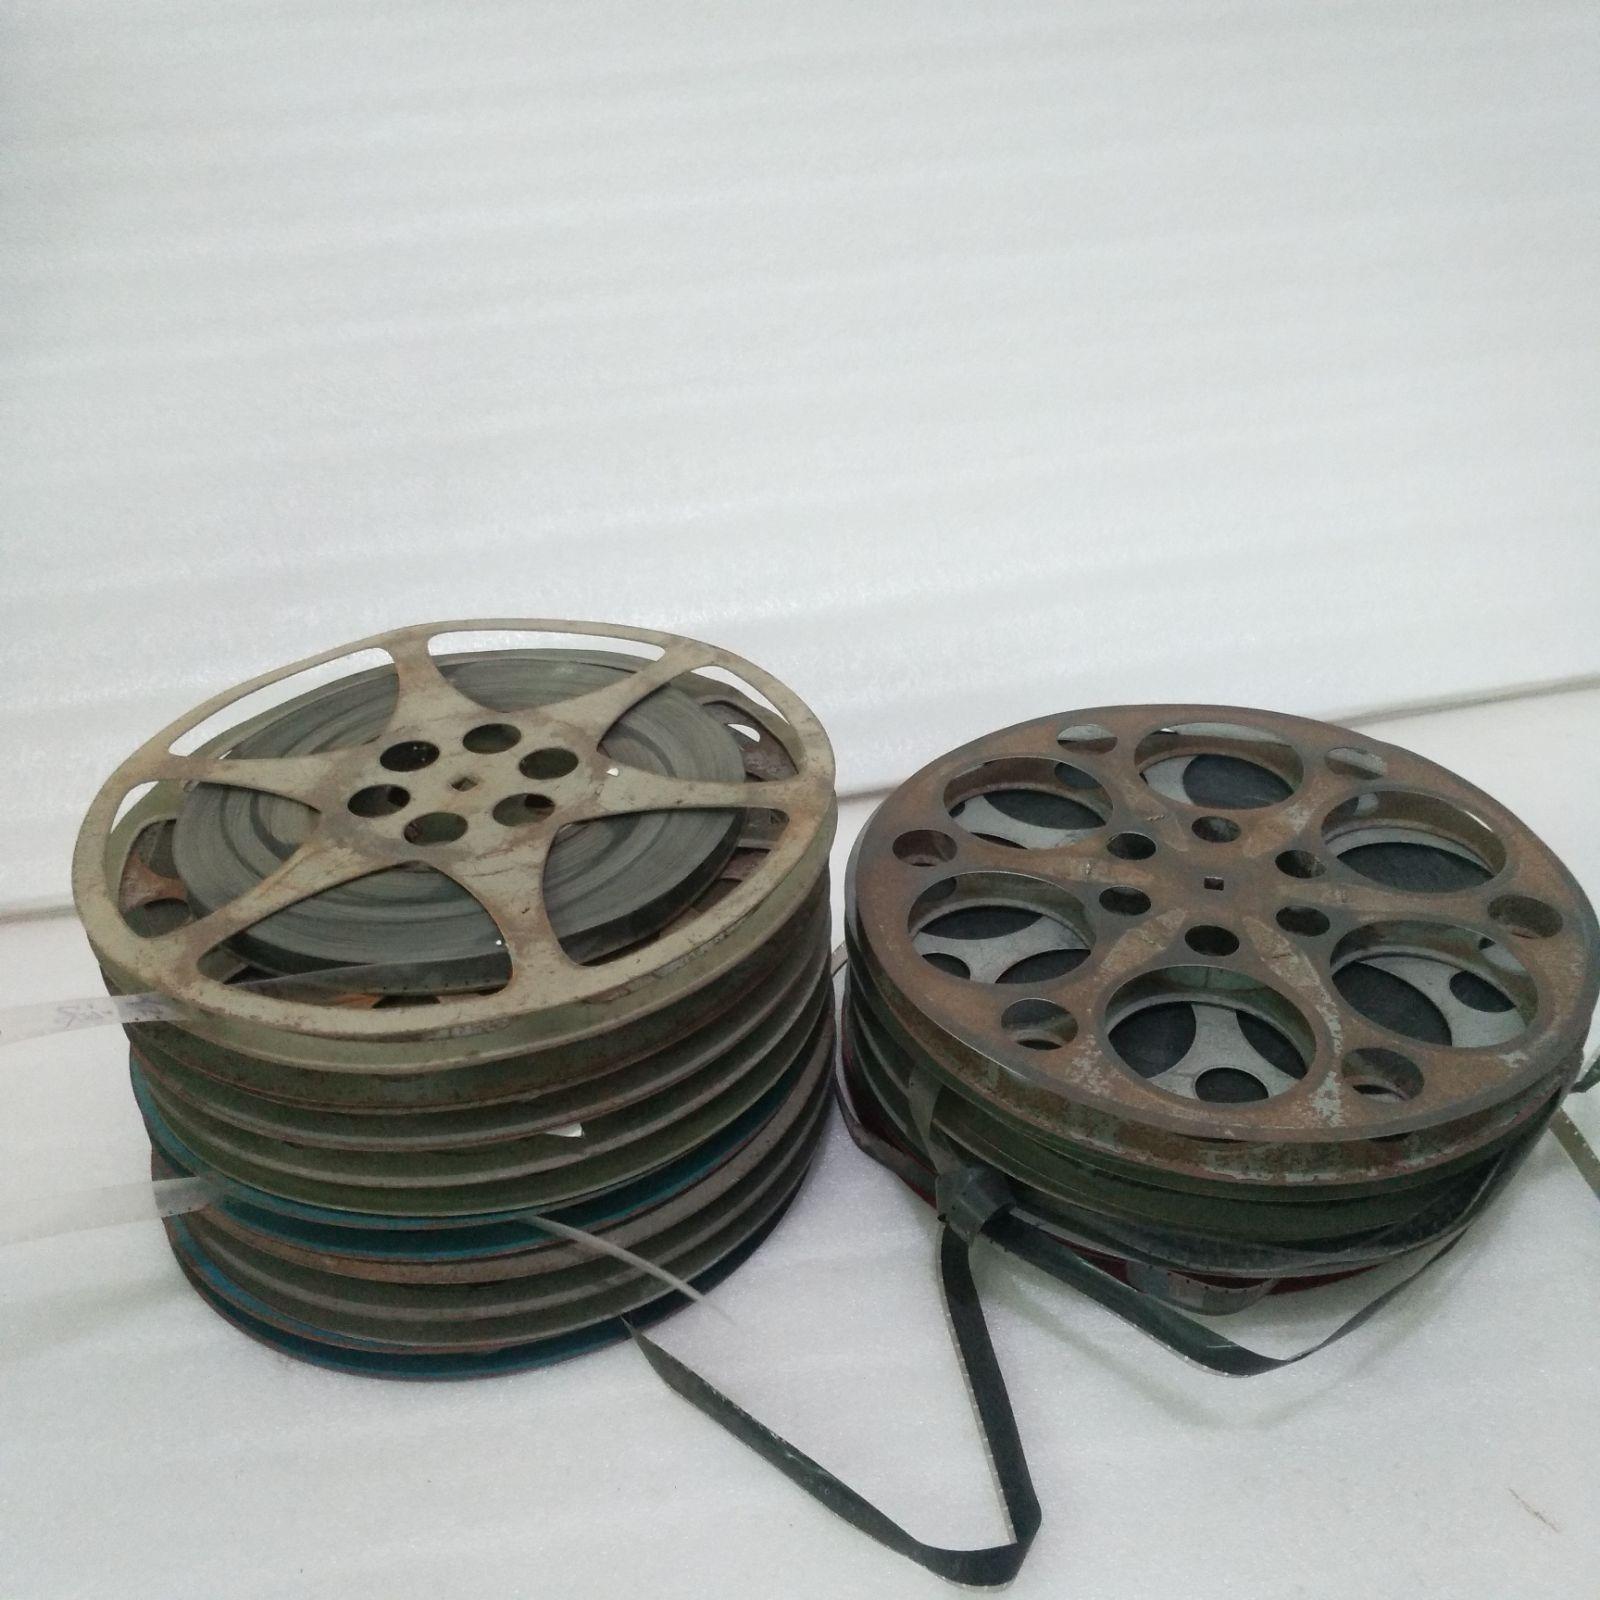 16 mm movie negative film copy special film armor clip ancient decorative decoration film and television props